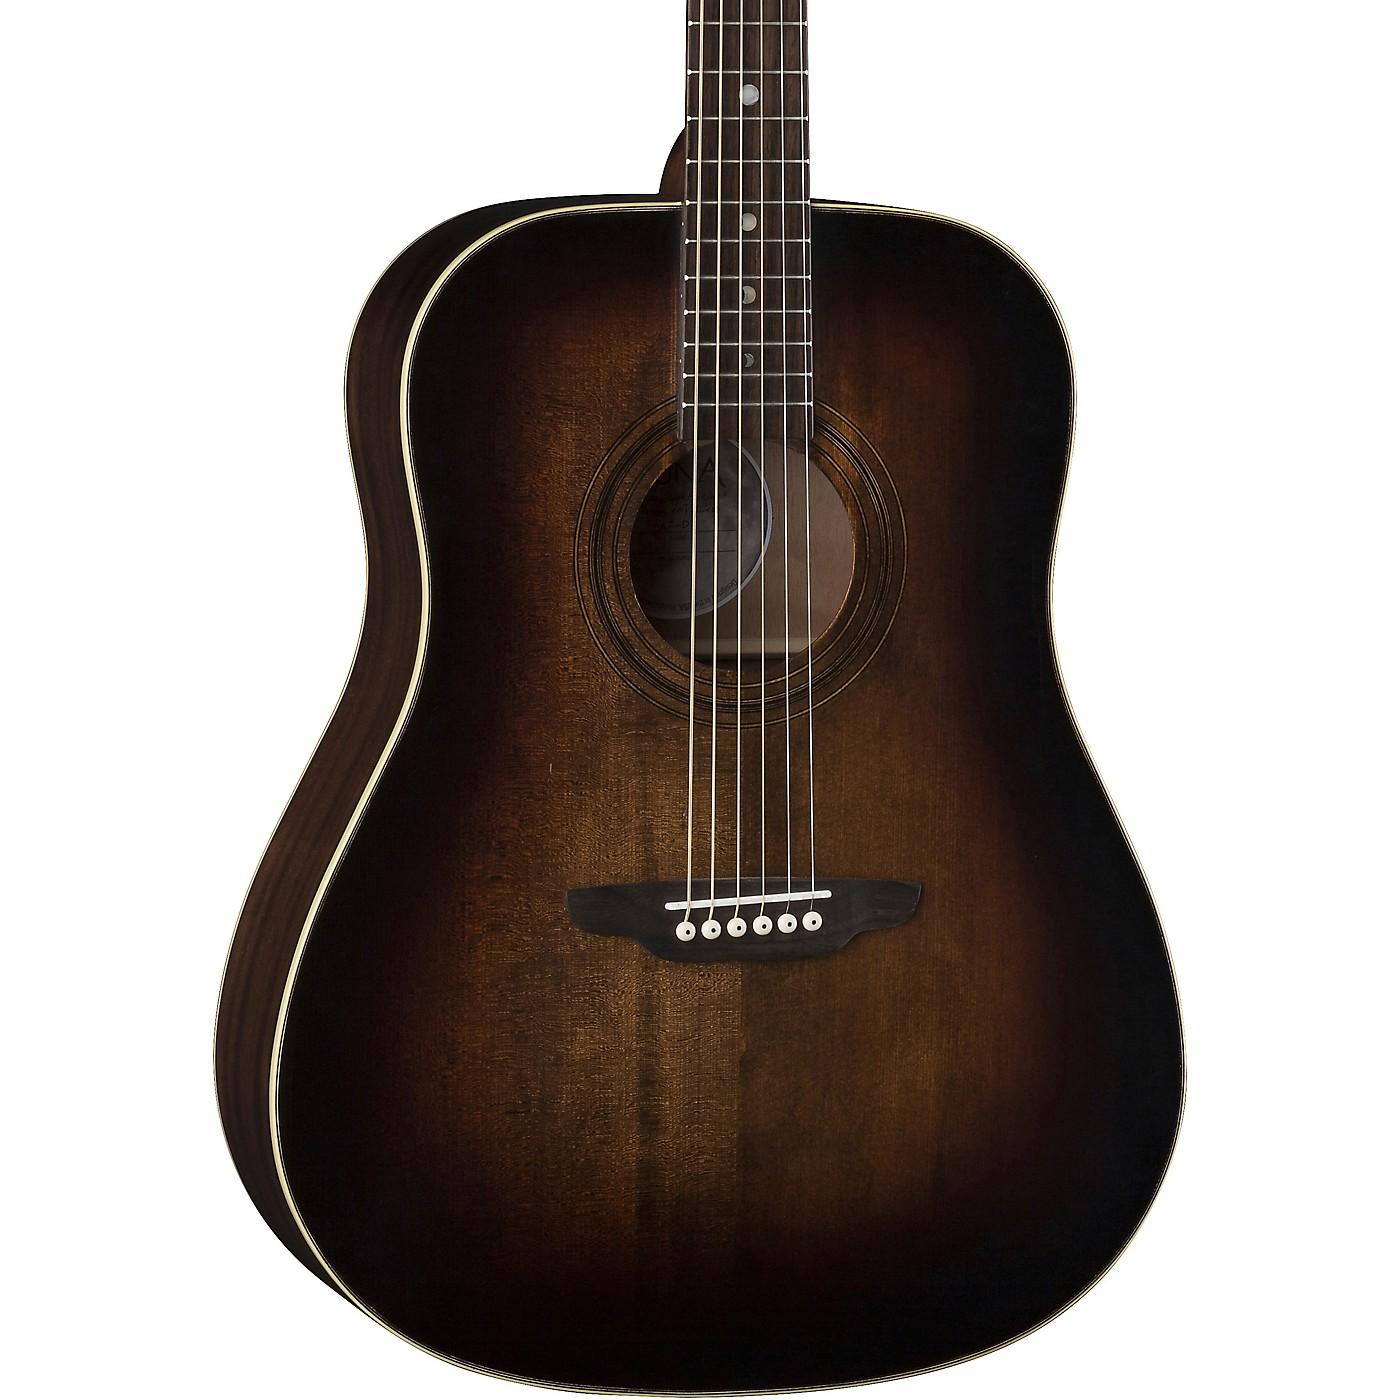 Luna Guitars Art Vintage Dread Solid Top Distressed Acoustic Guitar thumbnail